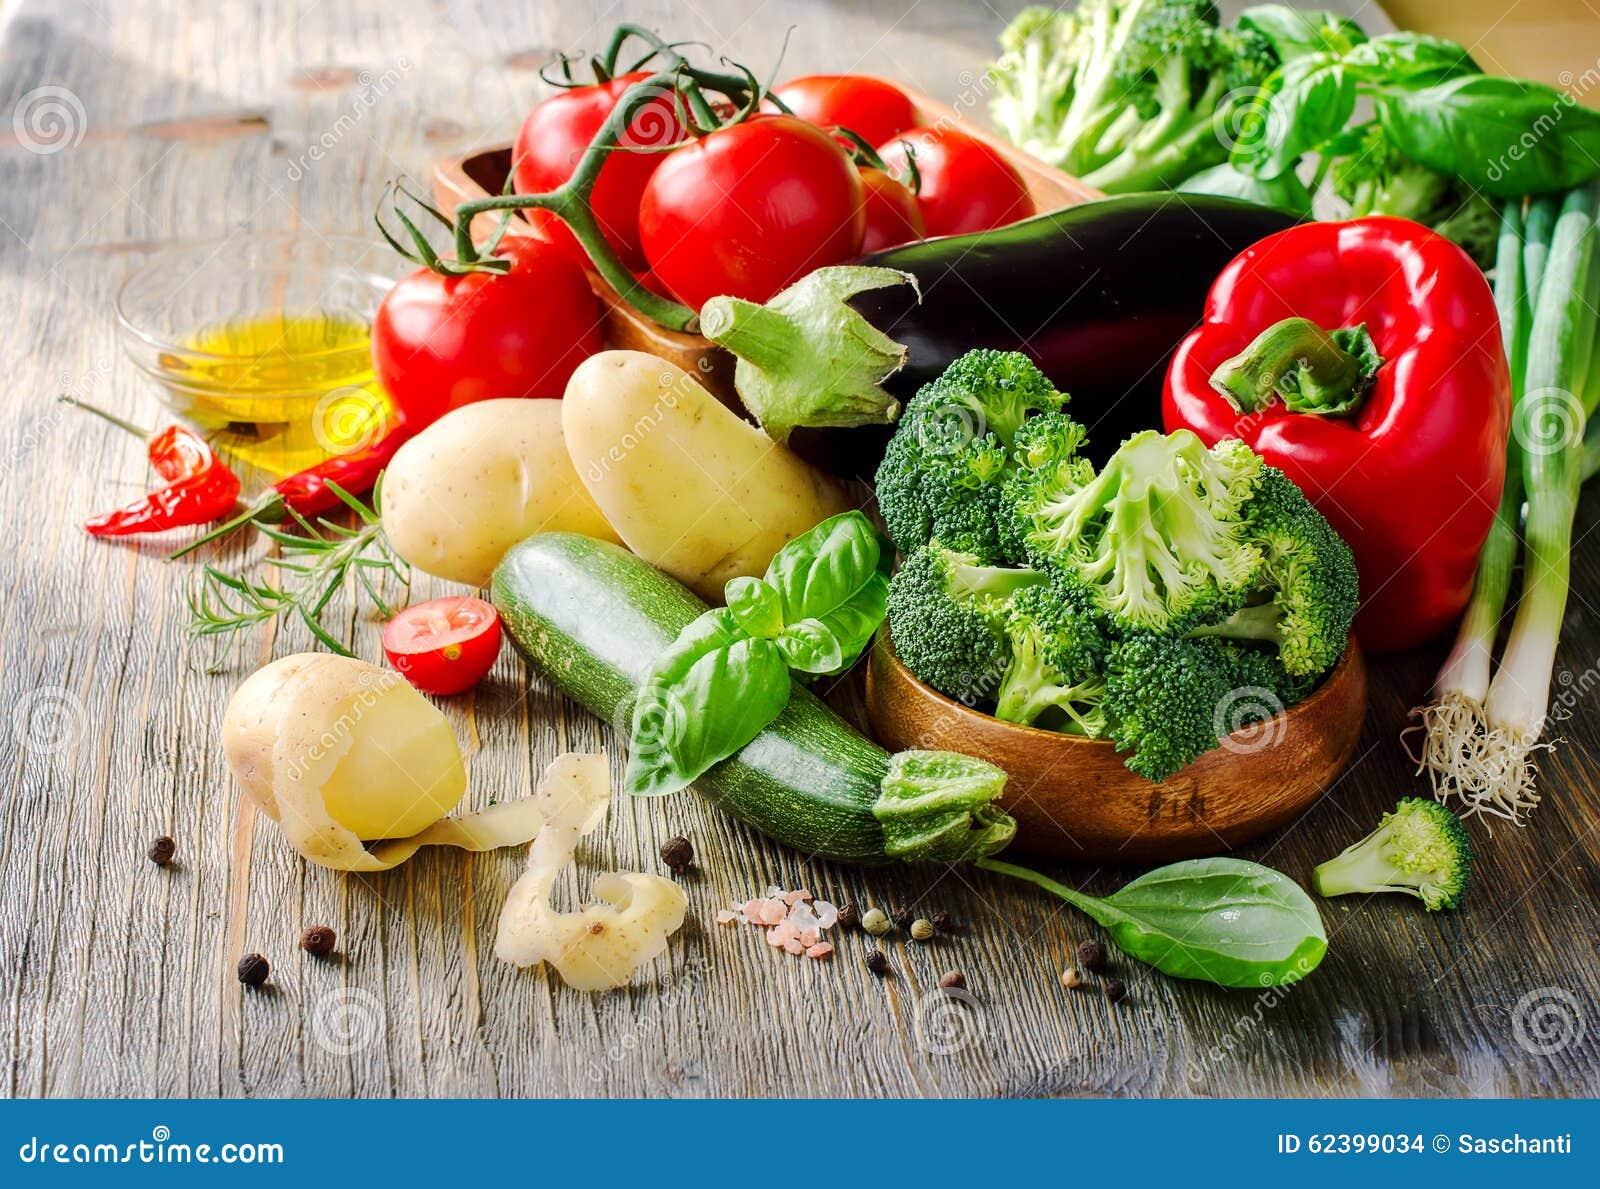 Vegetables for cooking healthy dinner fresh vegan for V kitchen restaurant vegetarian food